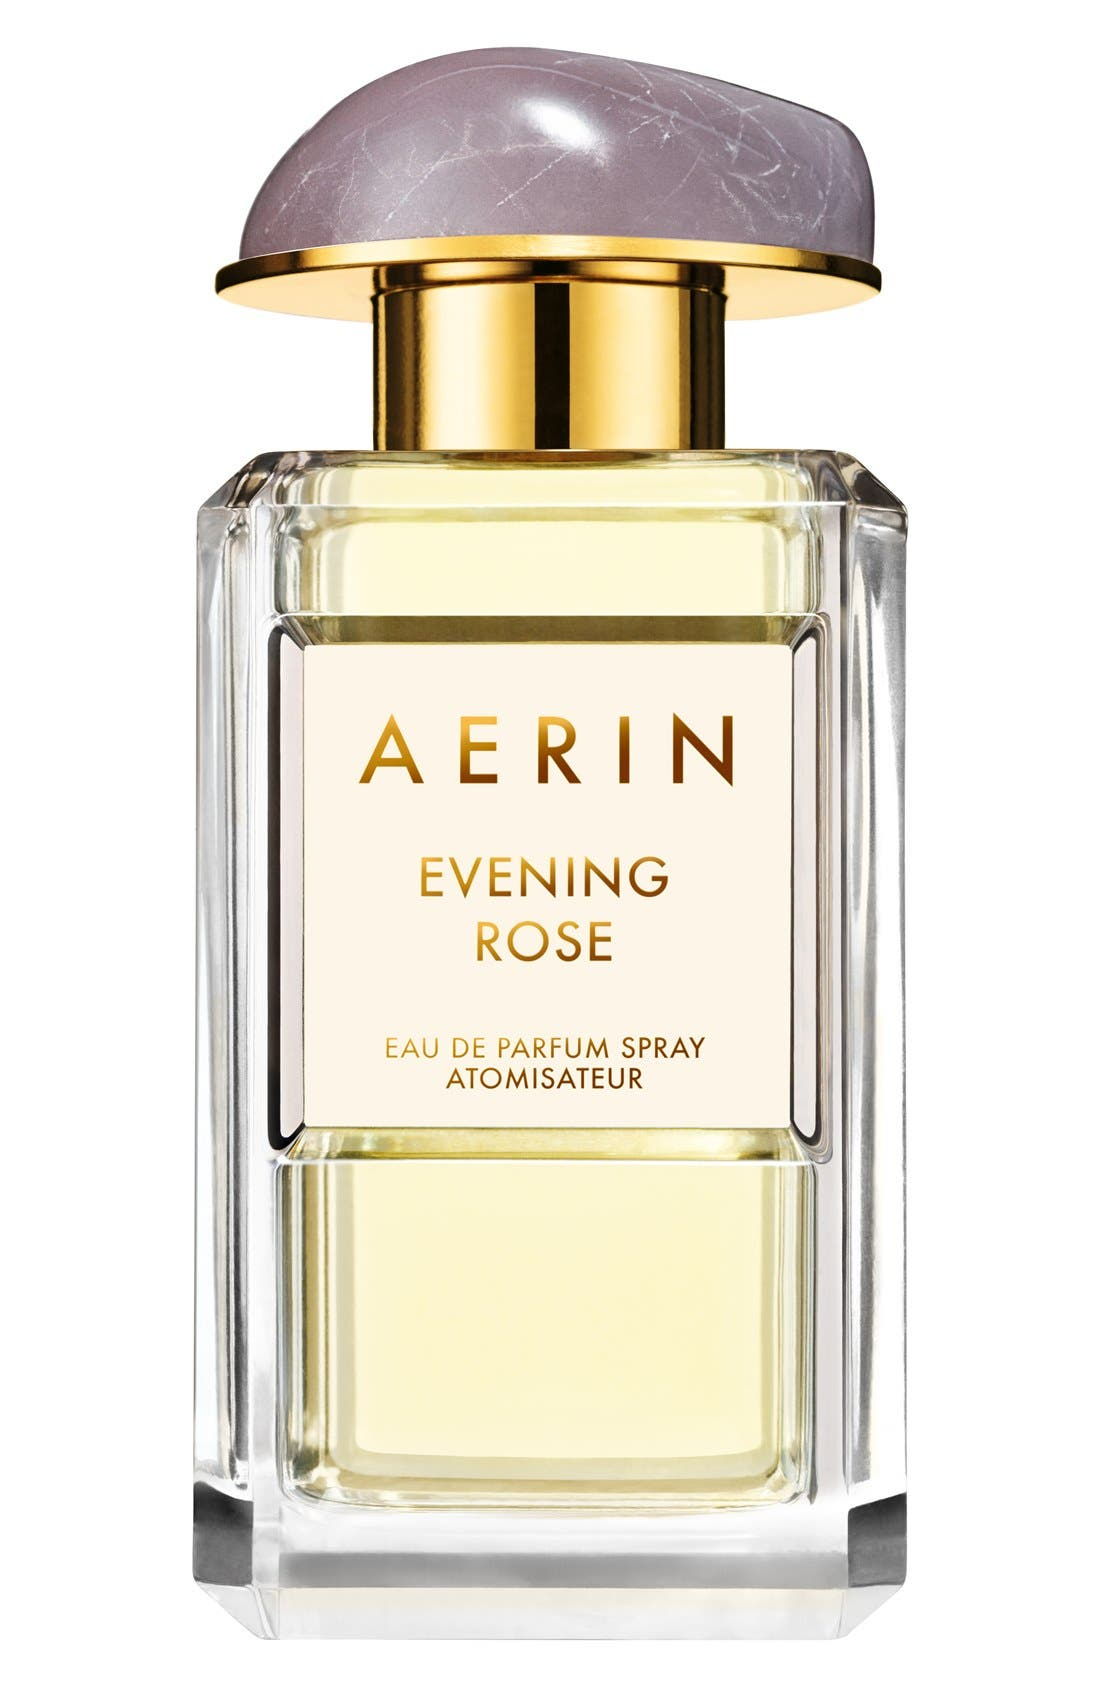 Aerin Beauty Evening Rose Eau De Parfum Spray